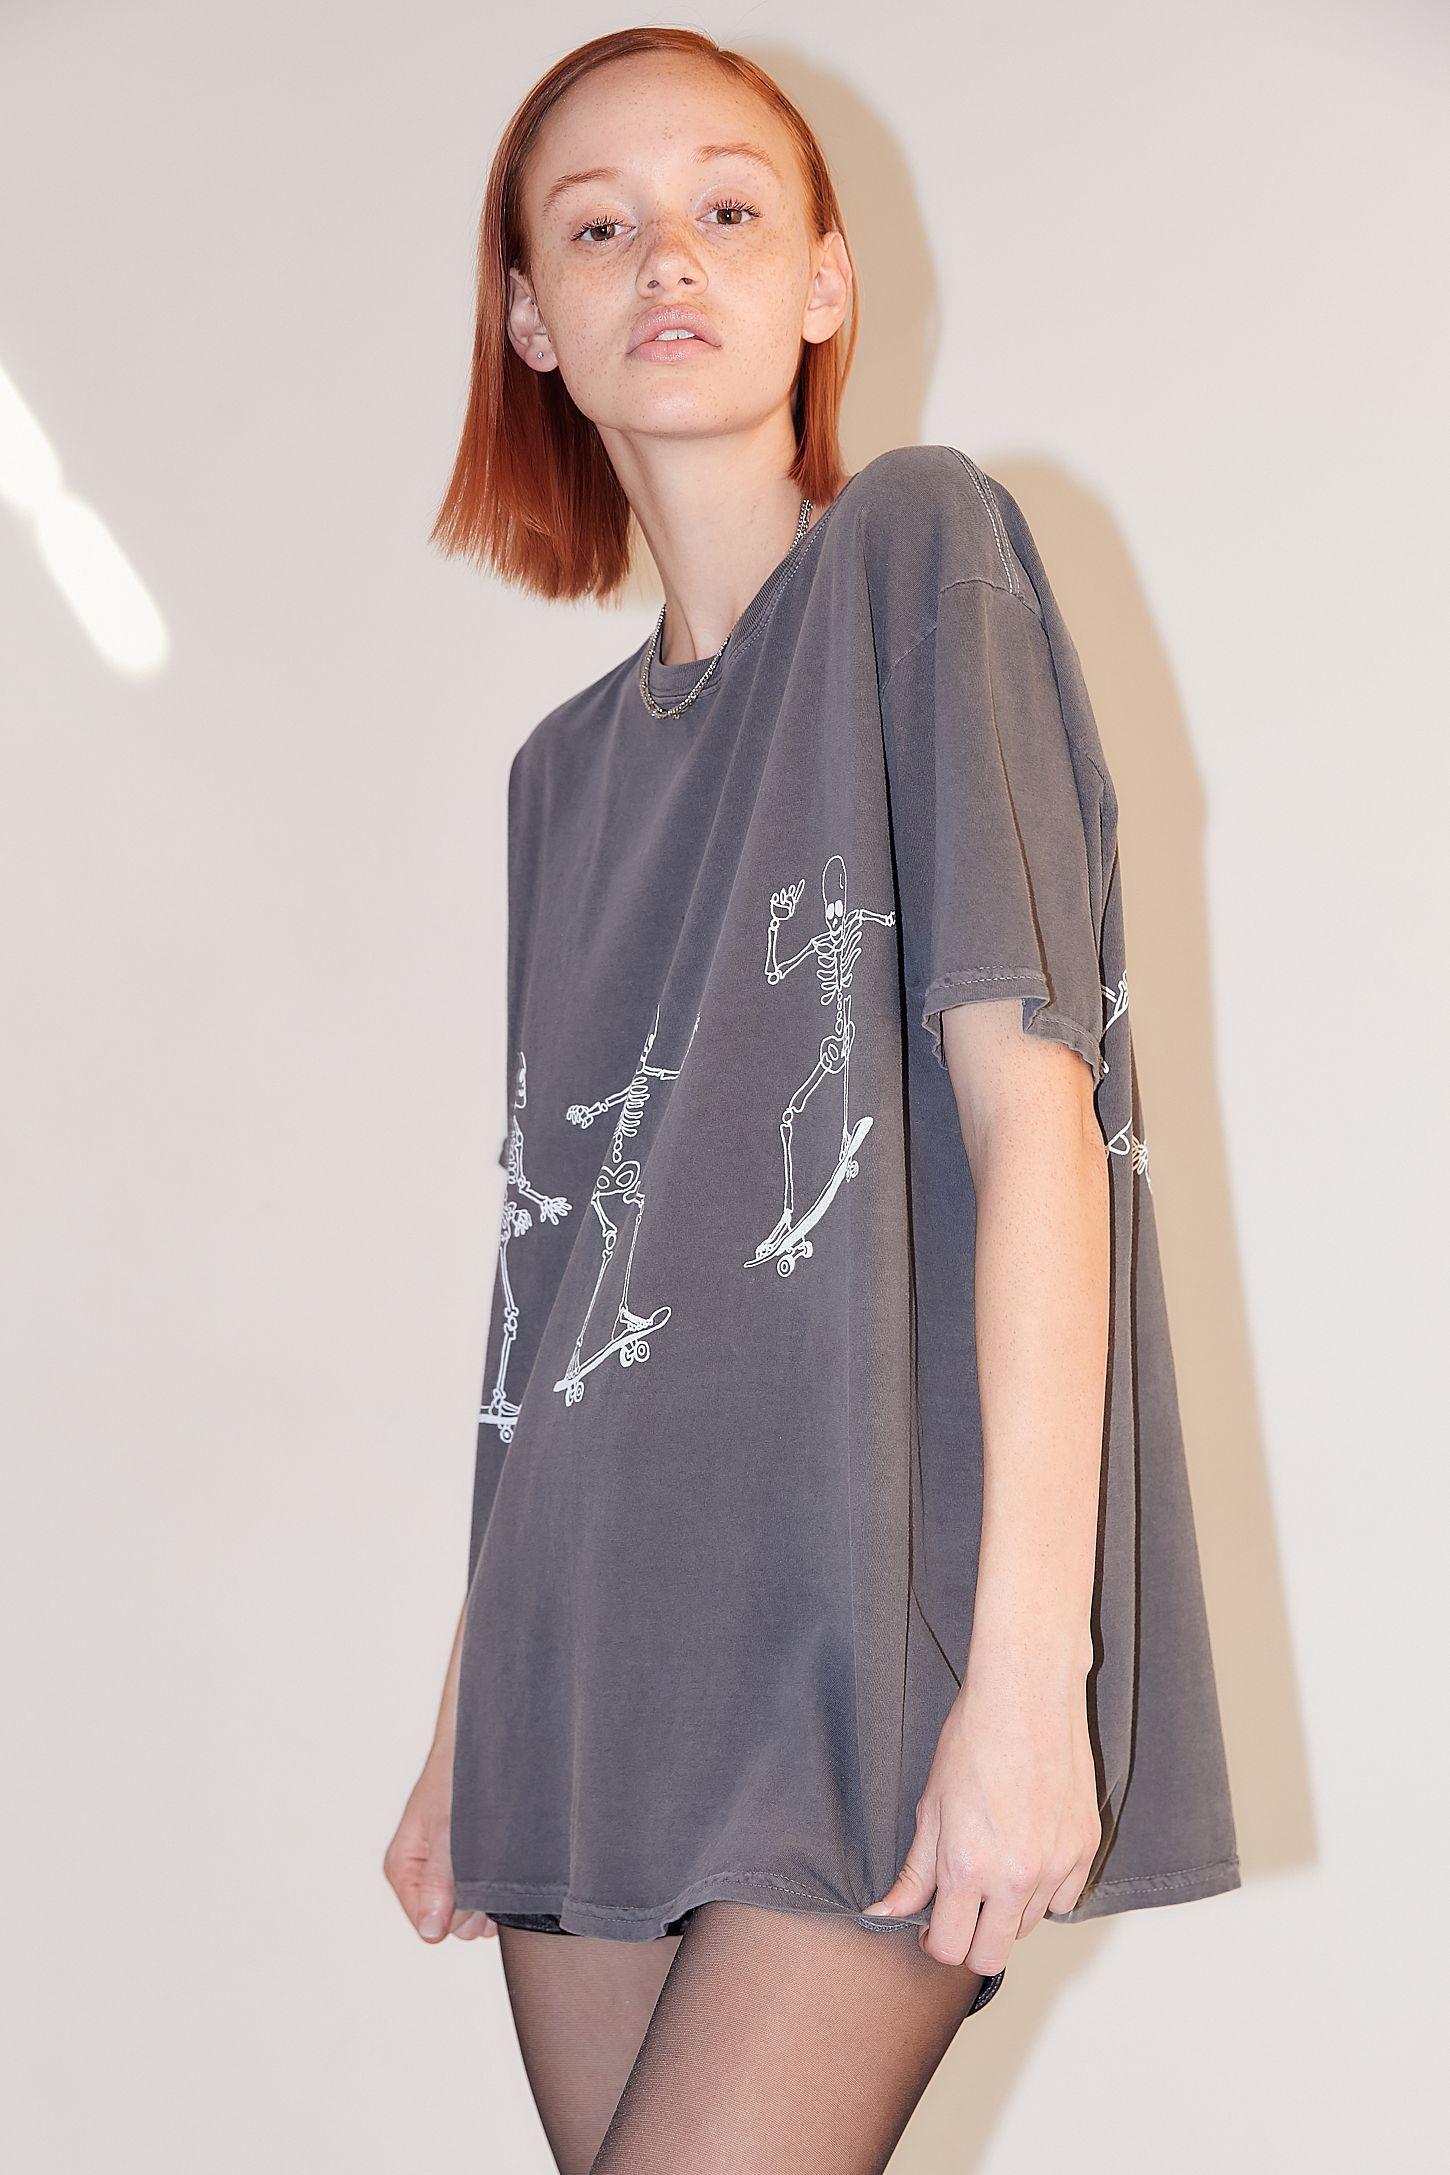 668ce42d7c4 Slide View: 4: Project Social T Skateboard Skeletons T-Shirt Dress